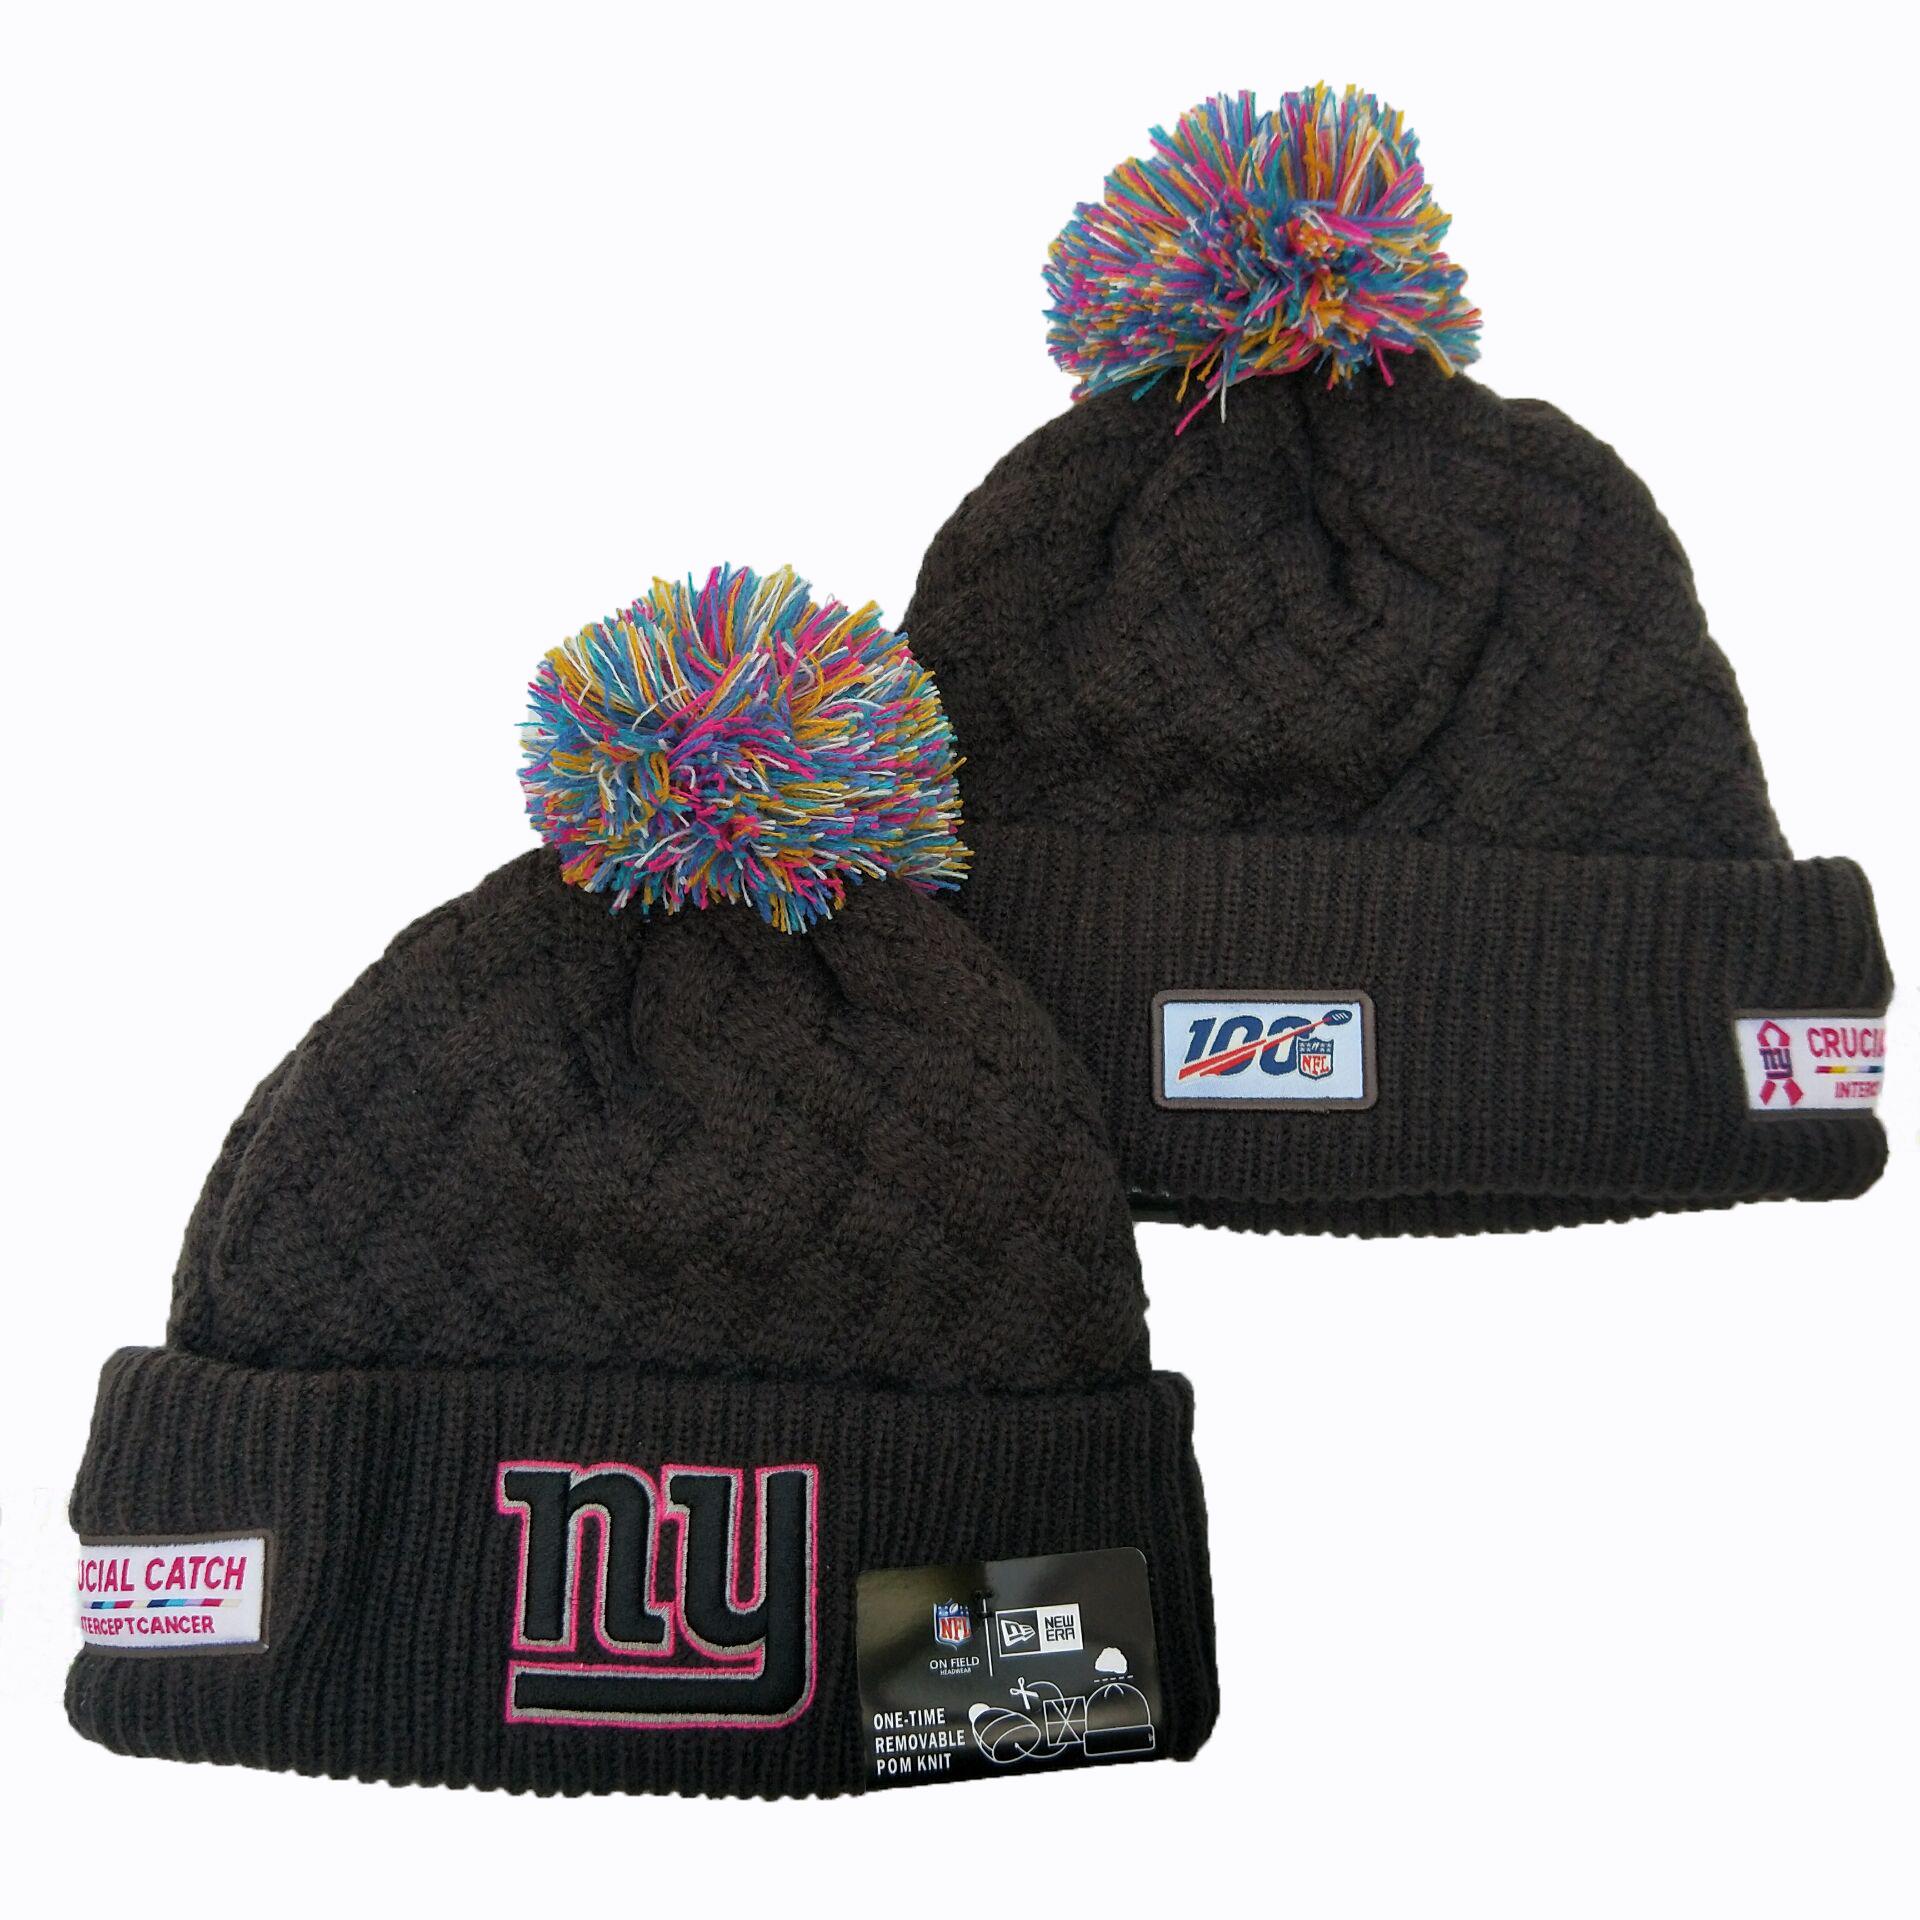 New York Giants Team Logo Black 100th Season Pom Knit Hat YD